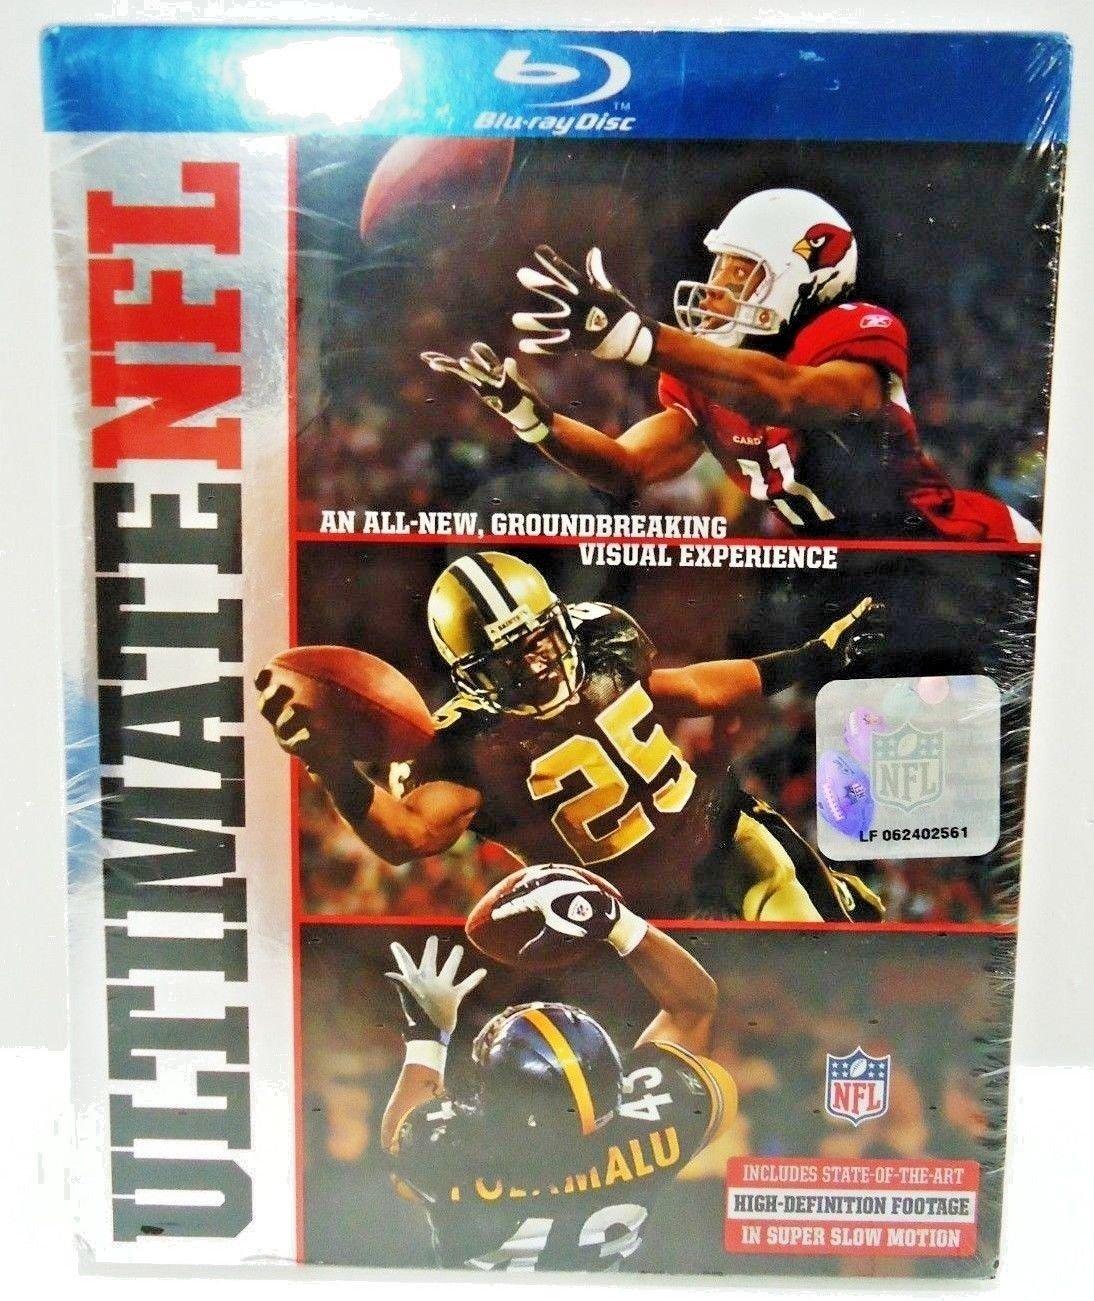 NFL: ULTIMATE NFL - DVD - BLU-RAY - FOOTBALL - BRAND NEW - SUPER BOWL - SPORTS